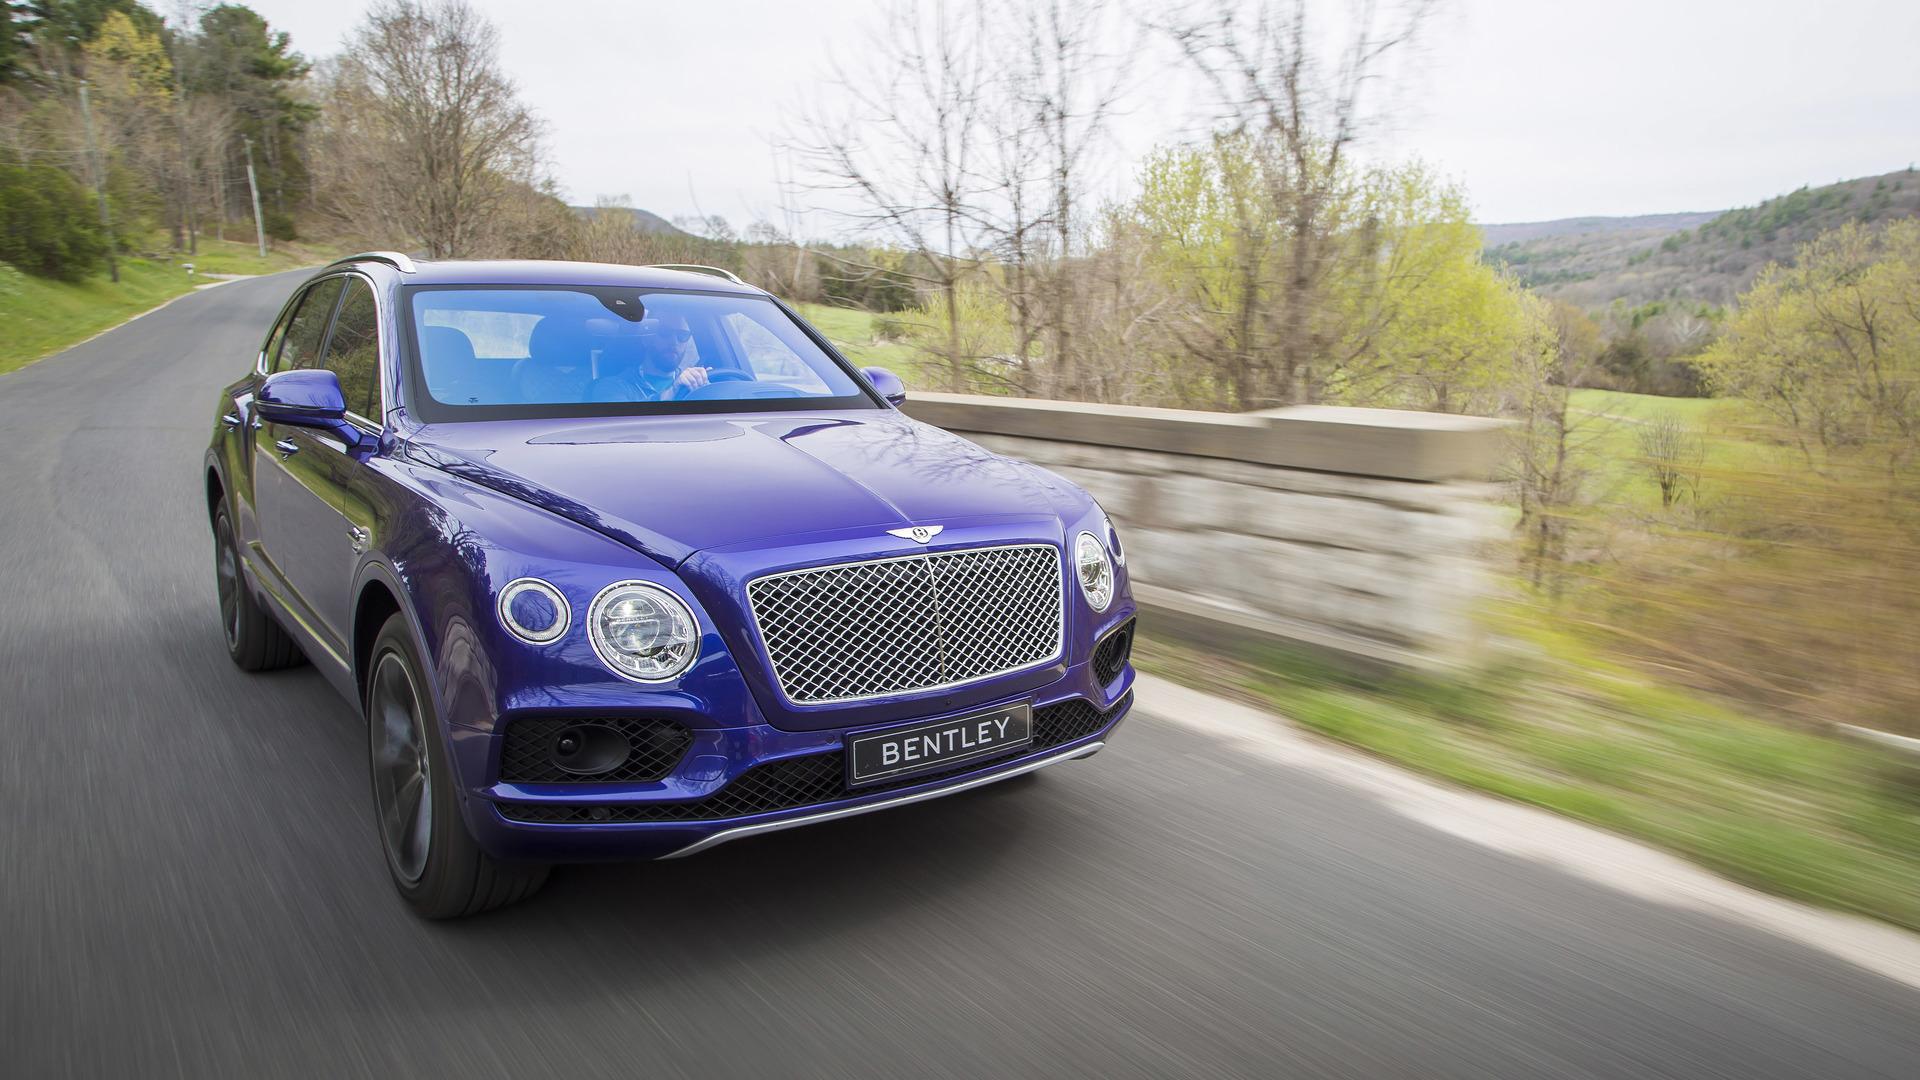 Bentley Continental GT 2017 tamamen yeni bir platformda